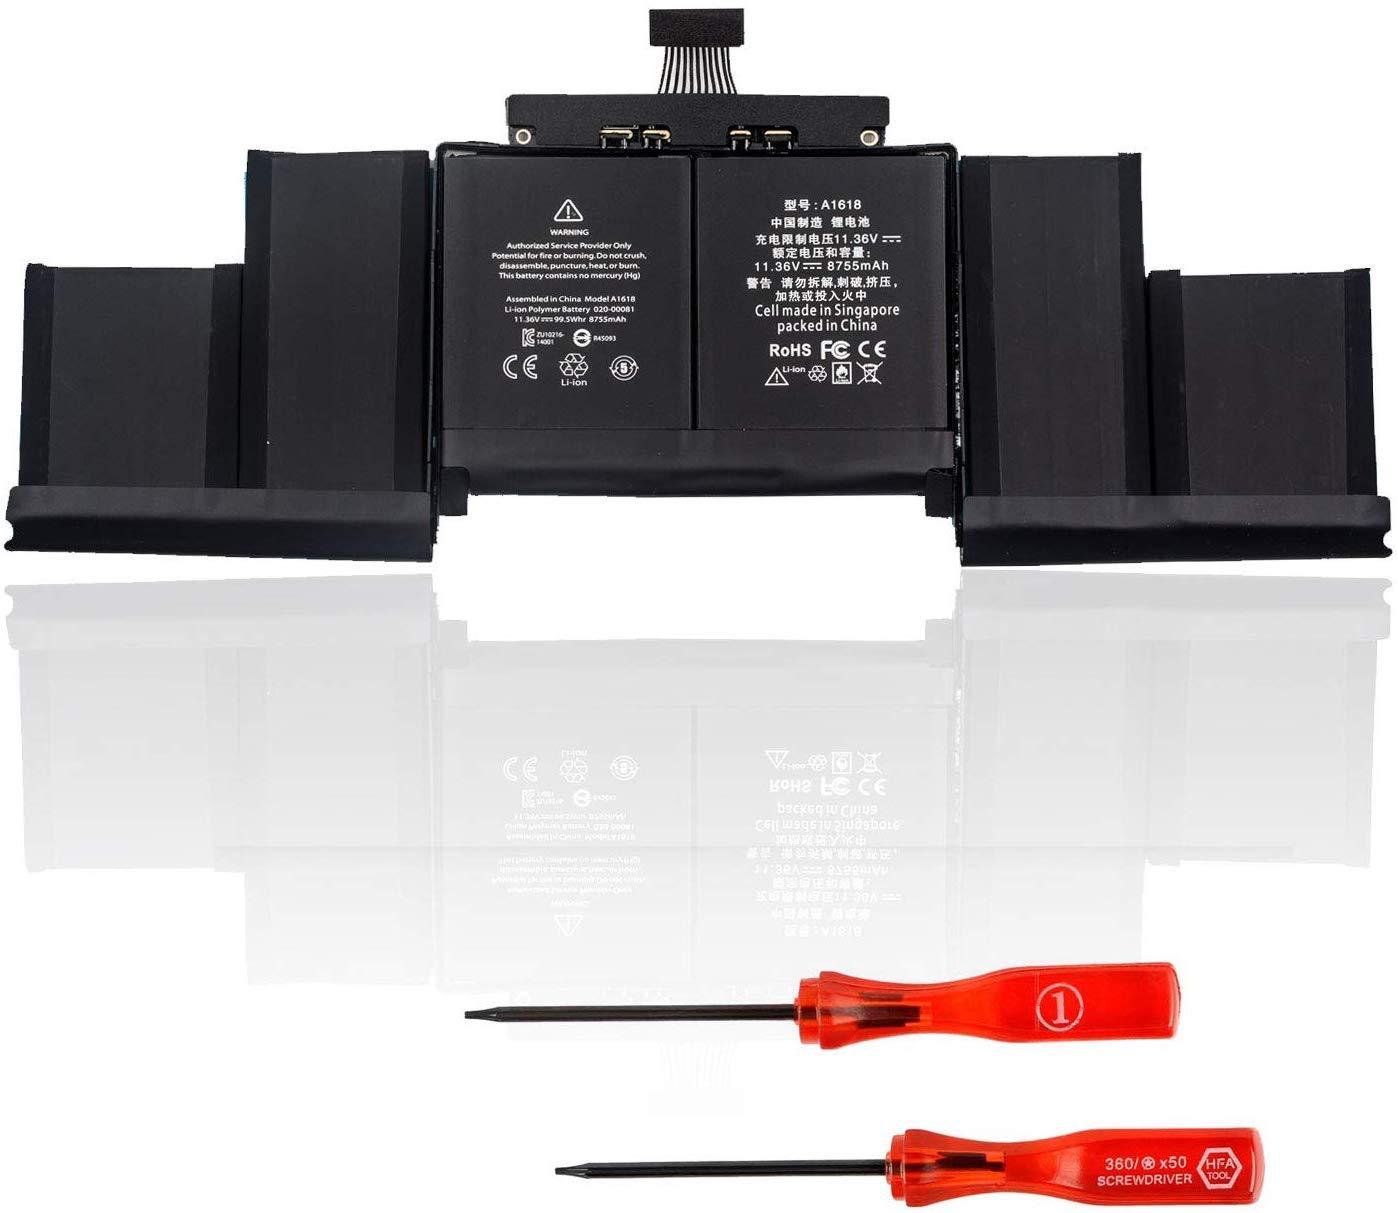 DTK A1618 Laptop Replacement Battery for A1398 Retina (2015 Version) 020-00079 MJLQ2LL/A MJLT2LL/A 11.34V 8800Mah